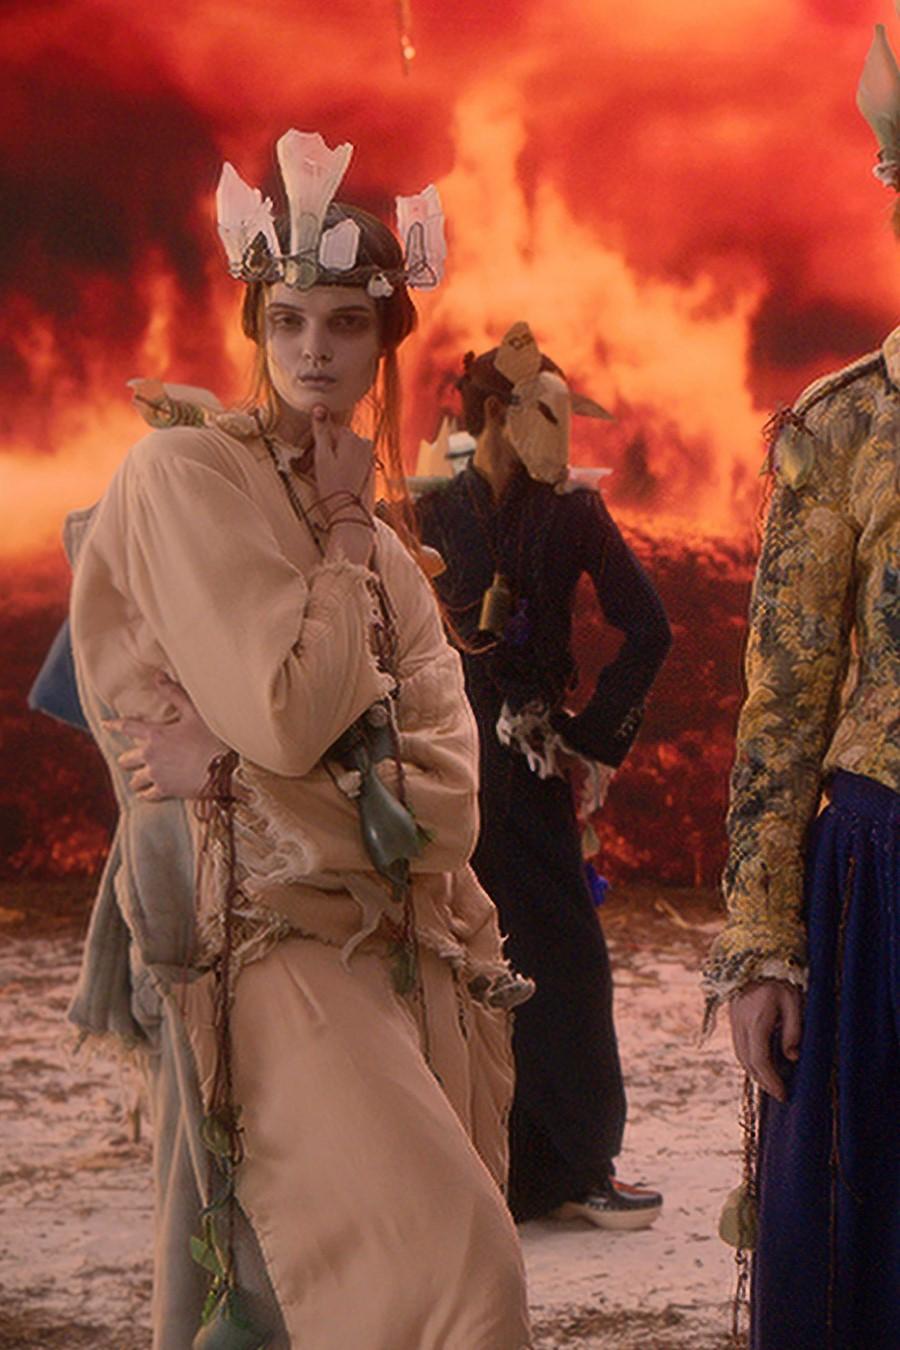 Maison Margiela Haute Couture Fall Winter 2021